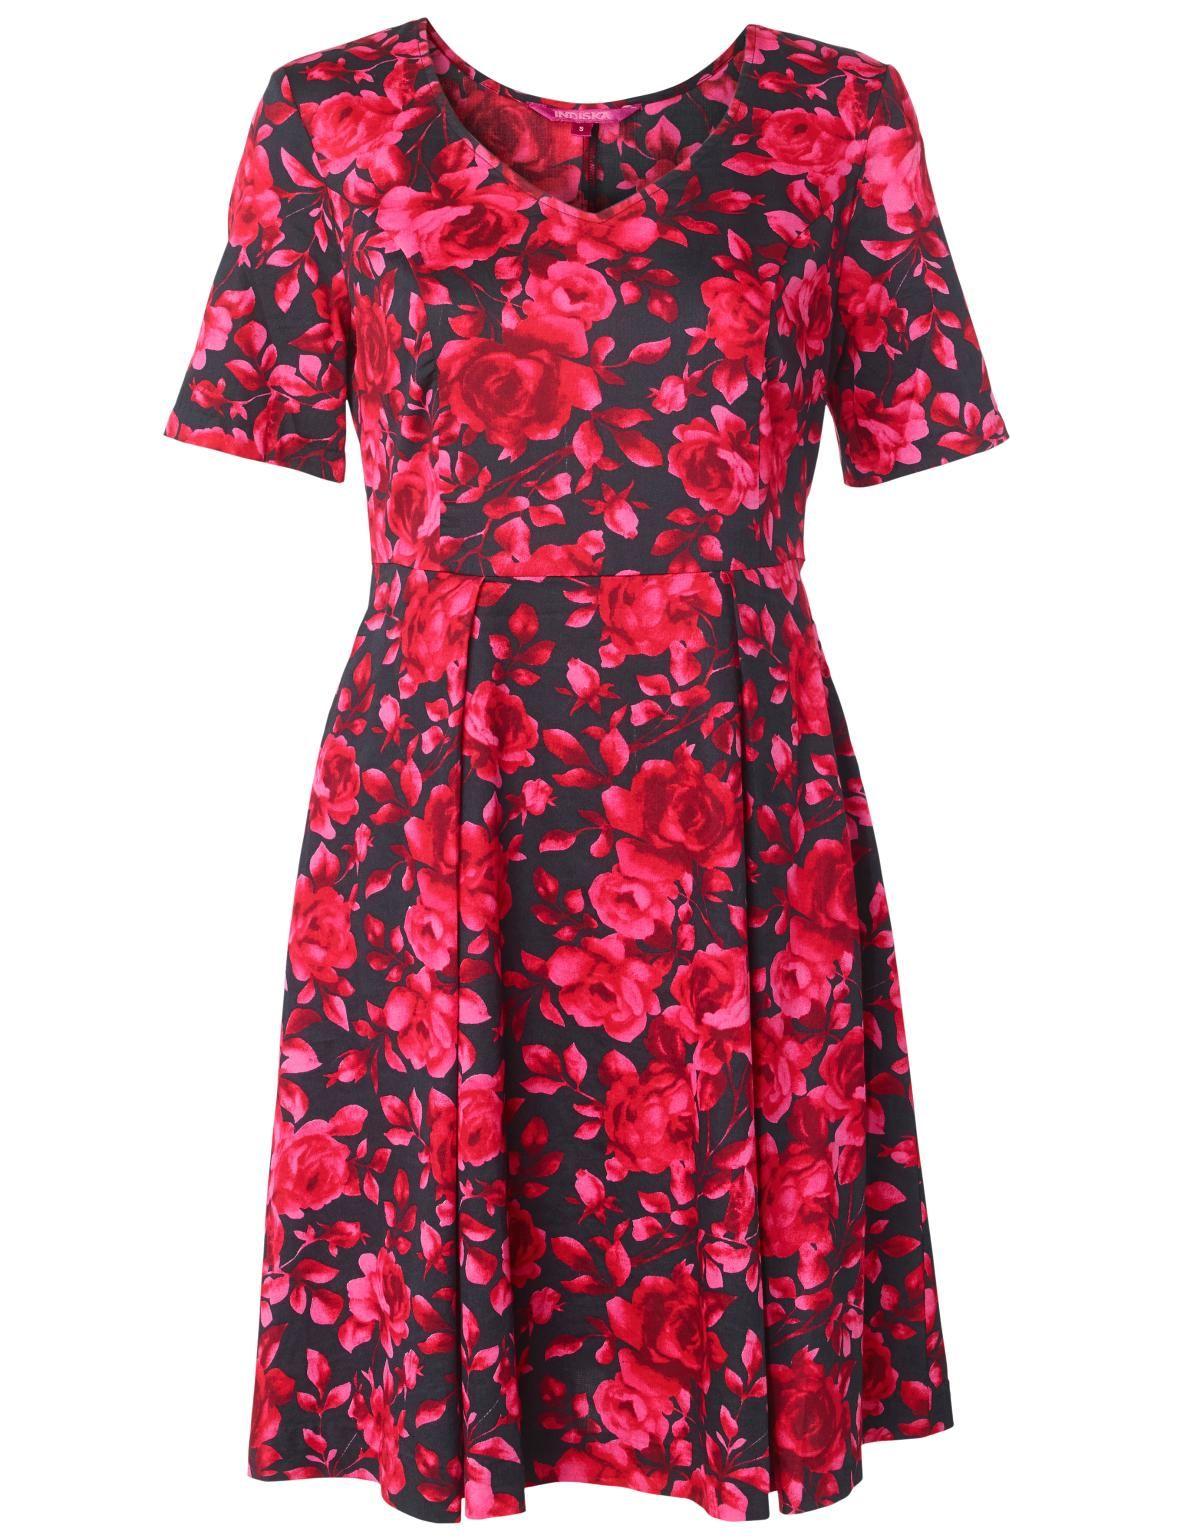 9dcae0fba857 Eco by Indiska Wrap Dress